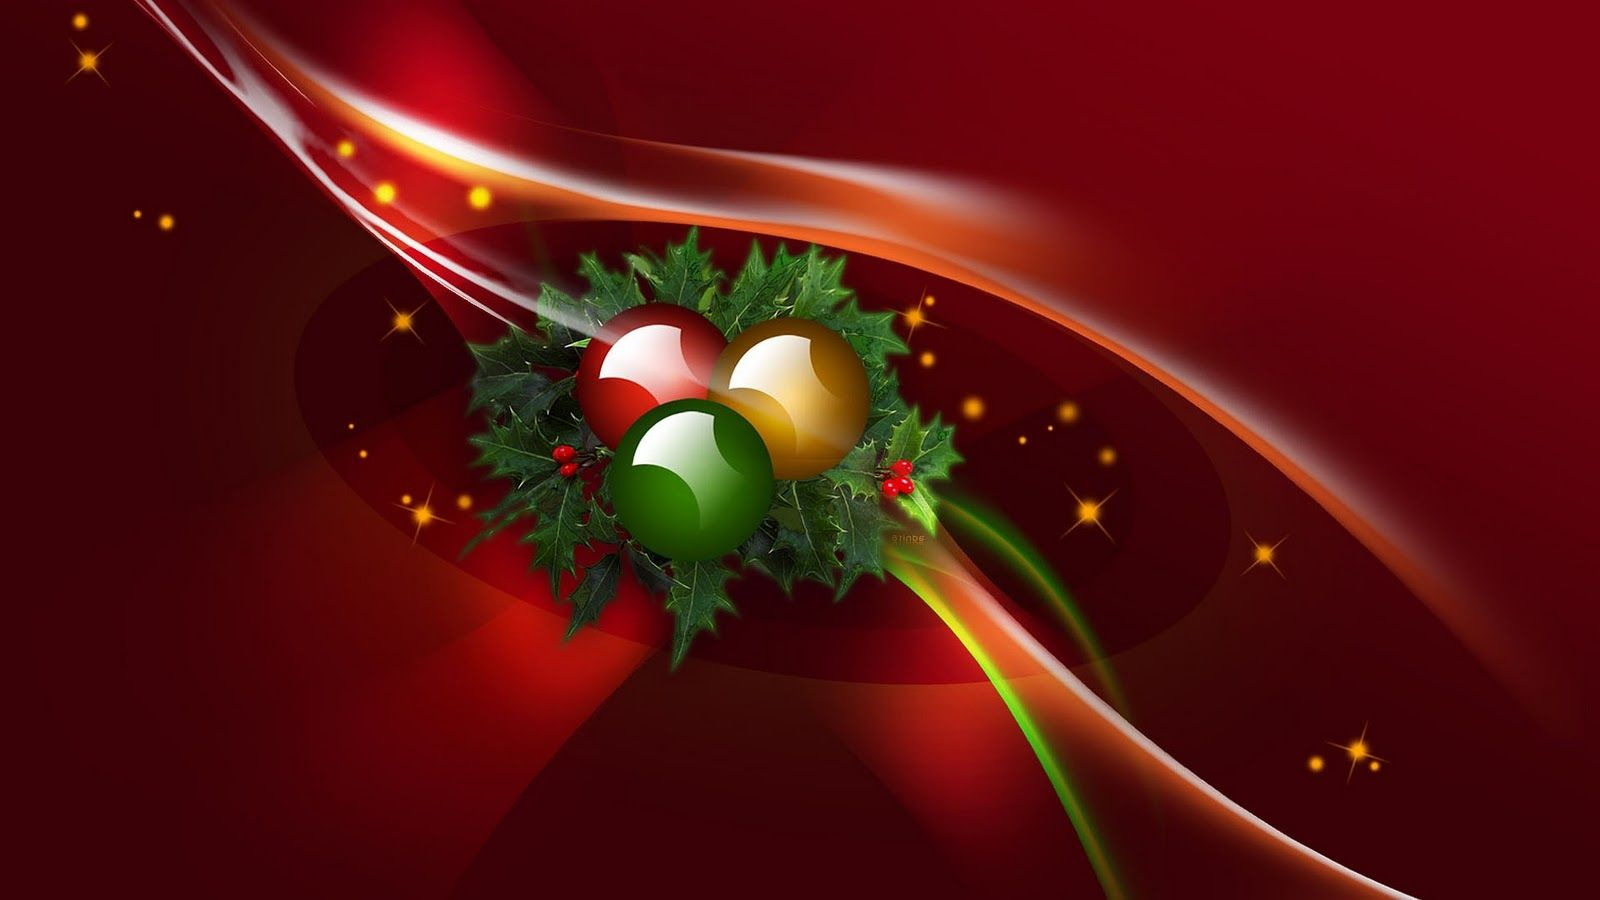 Weihnachtsbilder Hd.Fondos De Navidad En Hd Imagenes De Navidad Wallpapers Hd 23 Cool